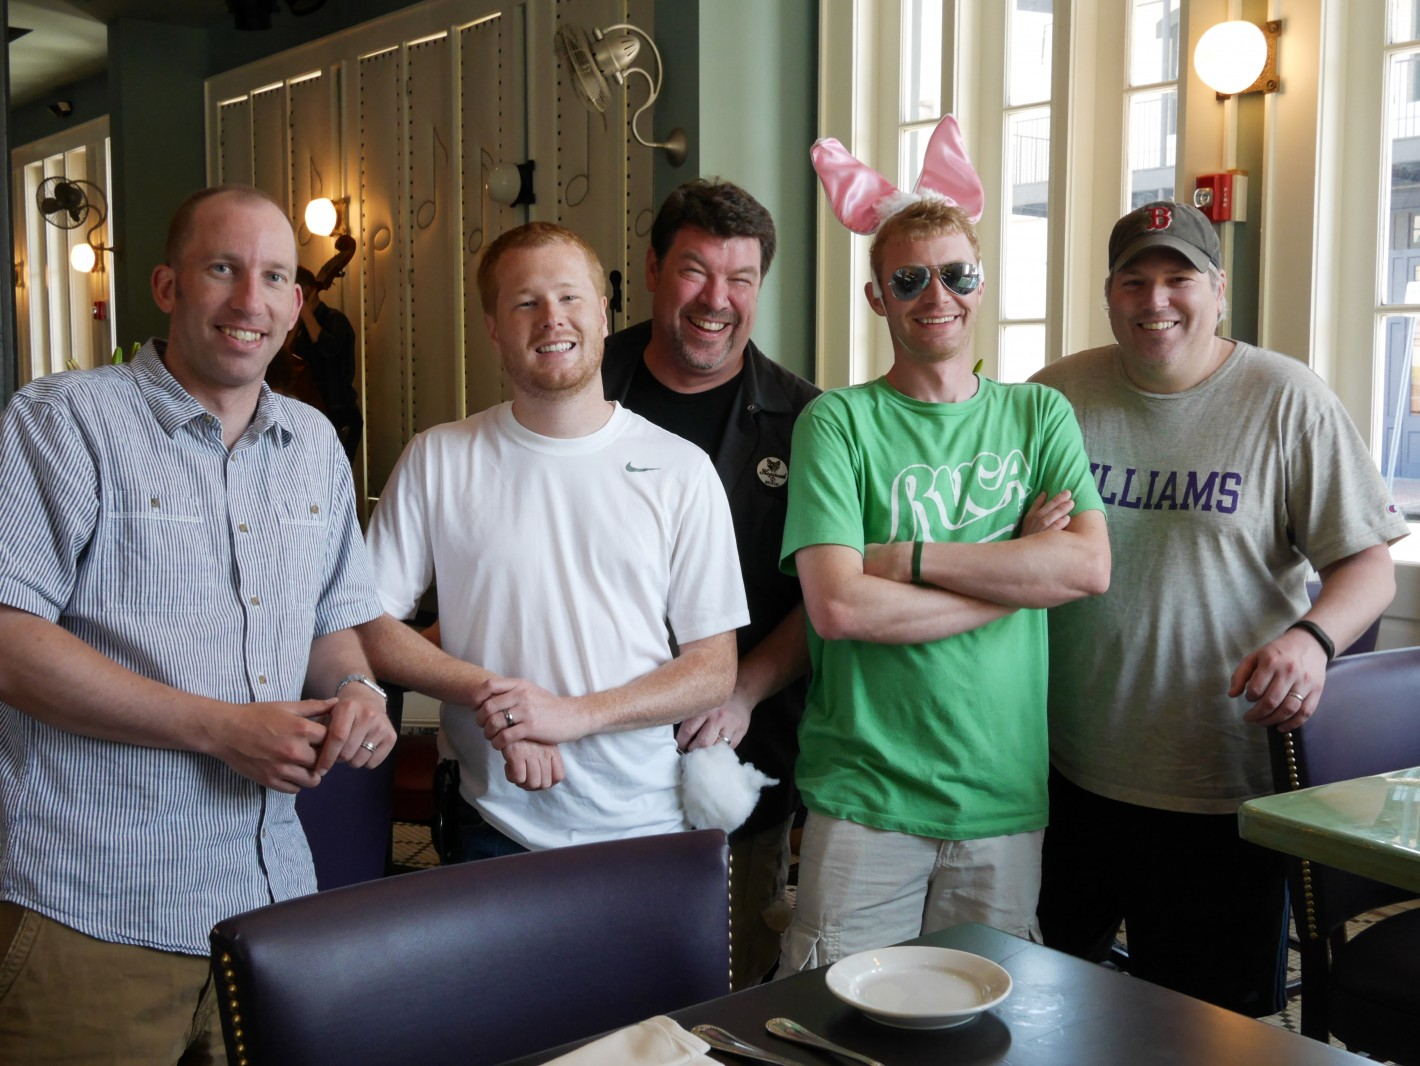 Me, Devin, Joe, Corey and Steve